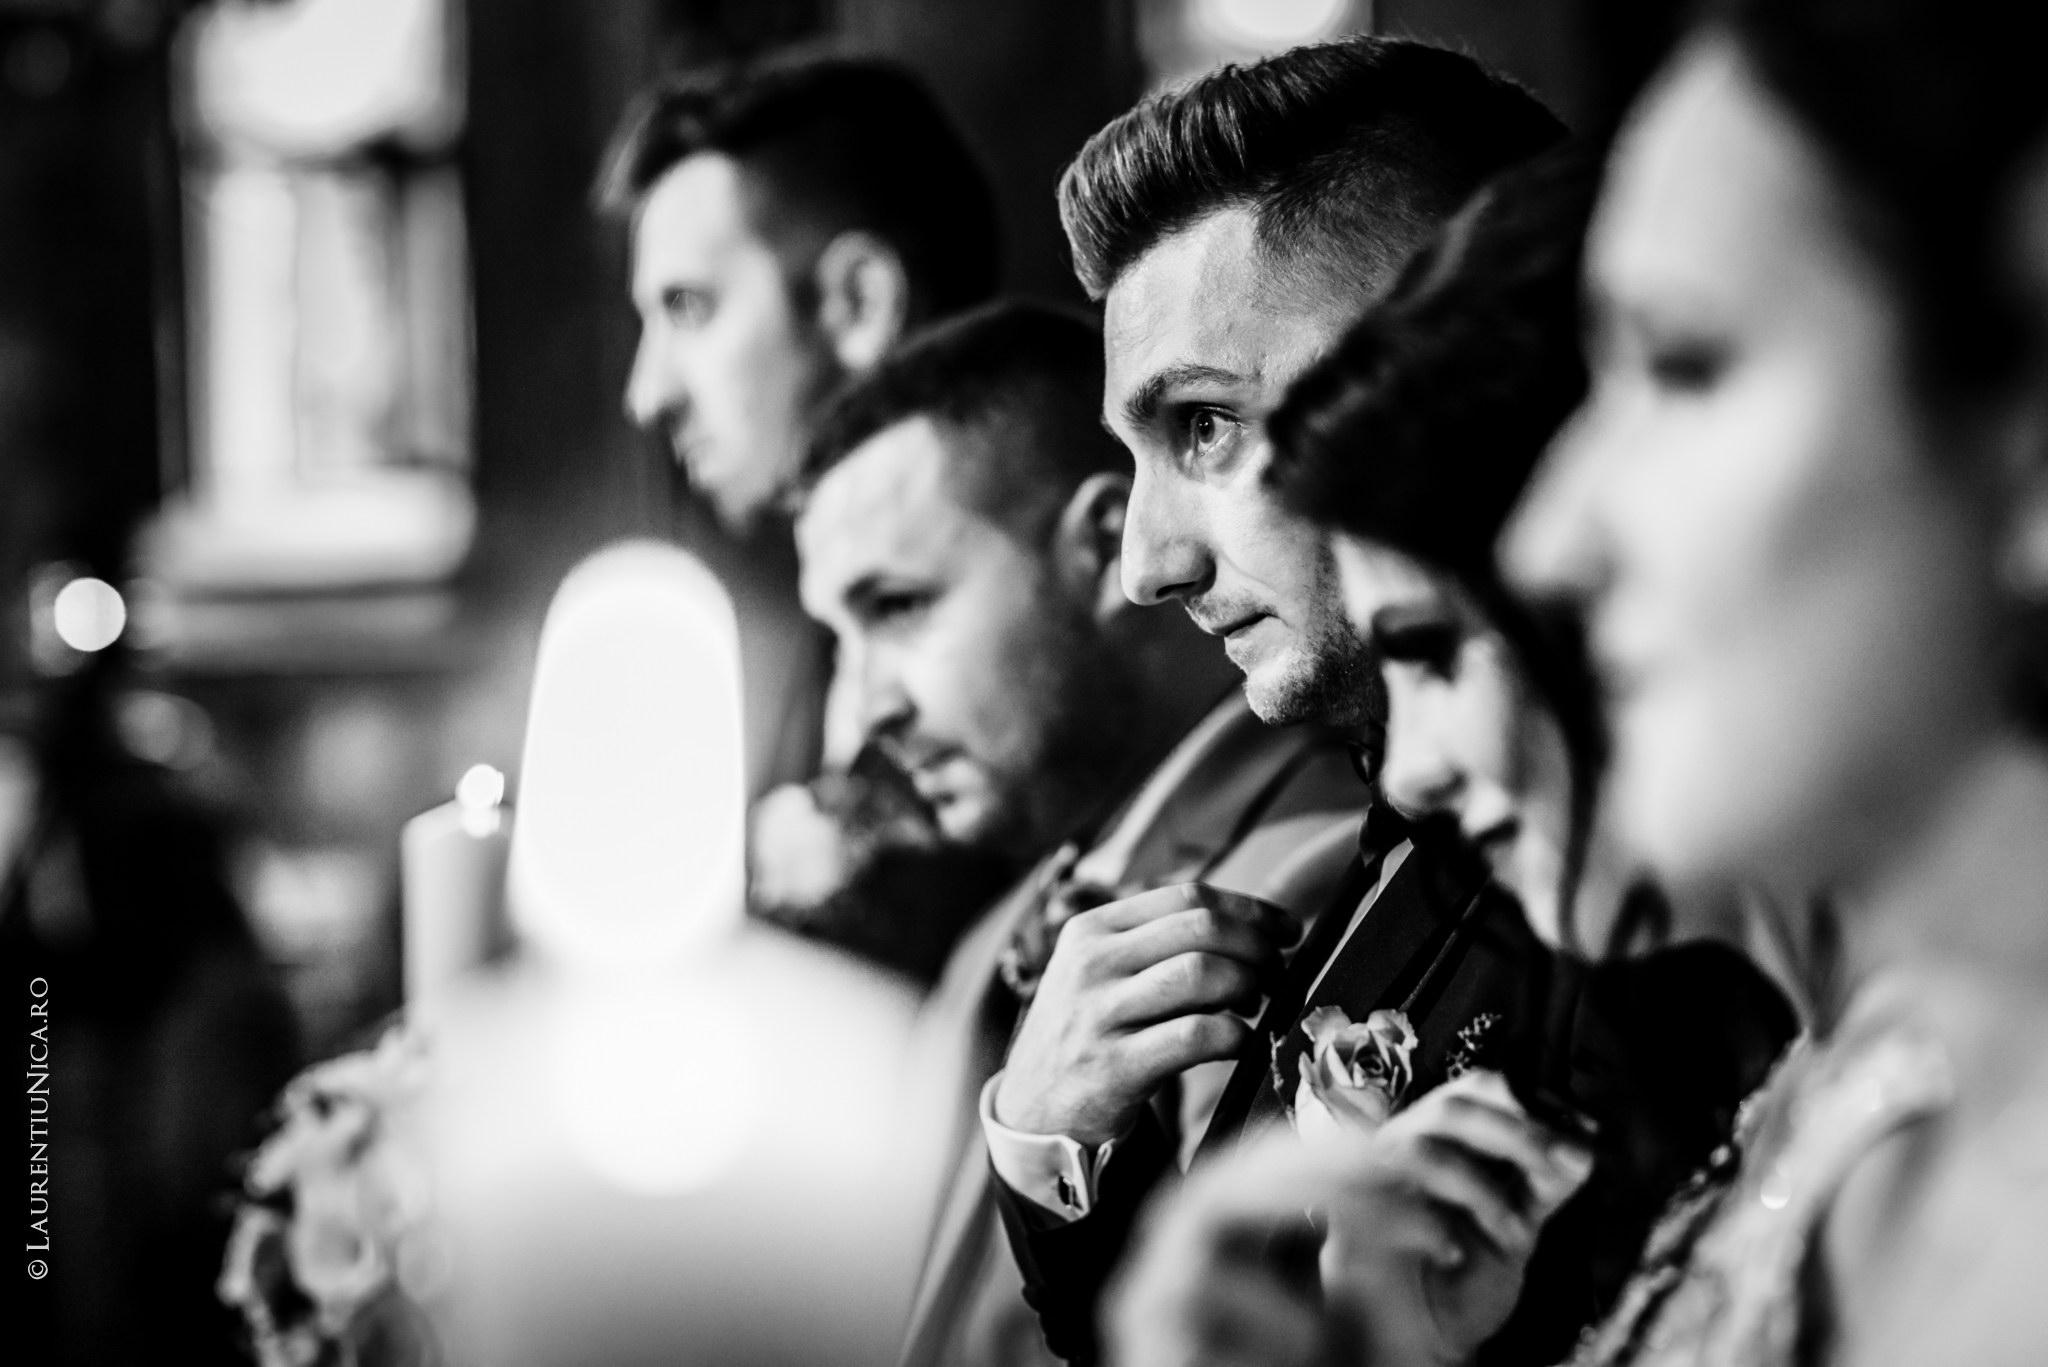 fotografii nunta craiova bia alex fotograf nunta laurentiu nica 35 - Bia & Alex | Fotografii nunta | Craiova